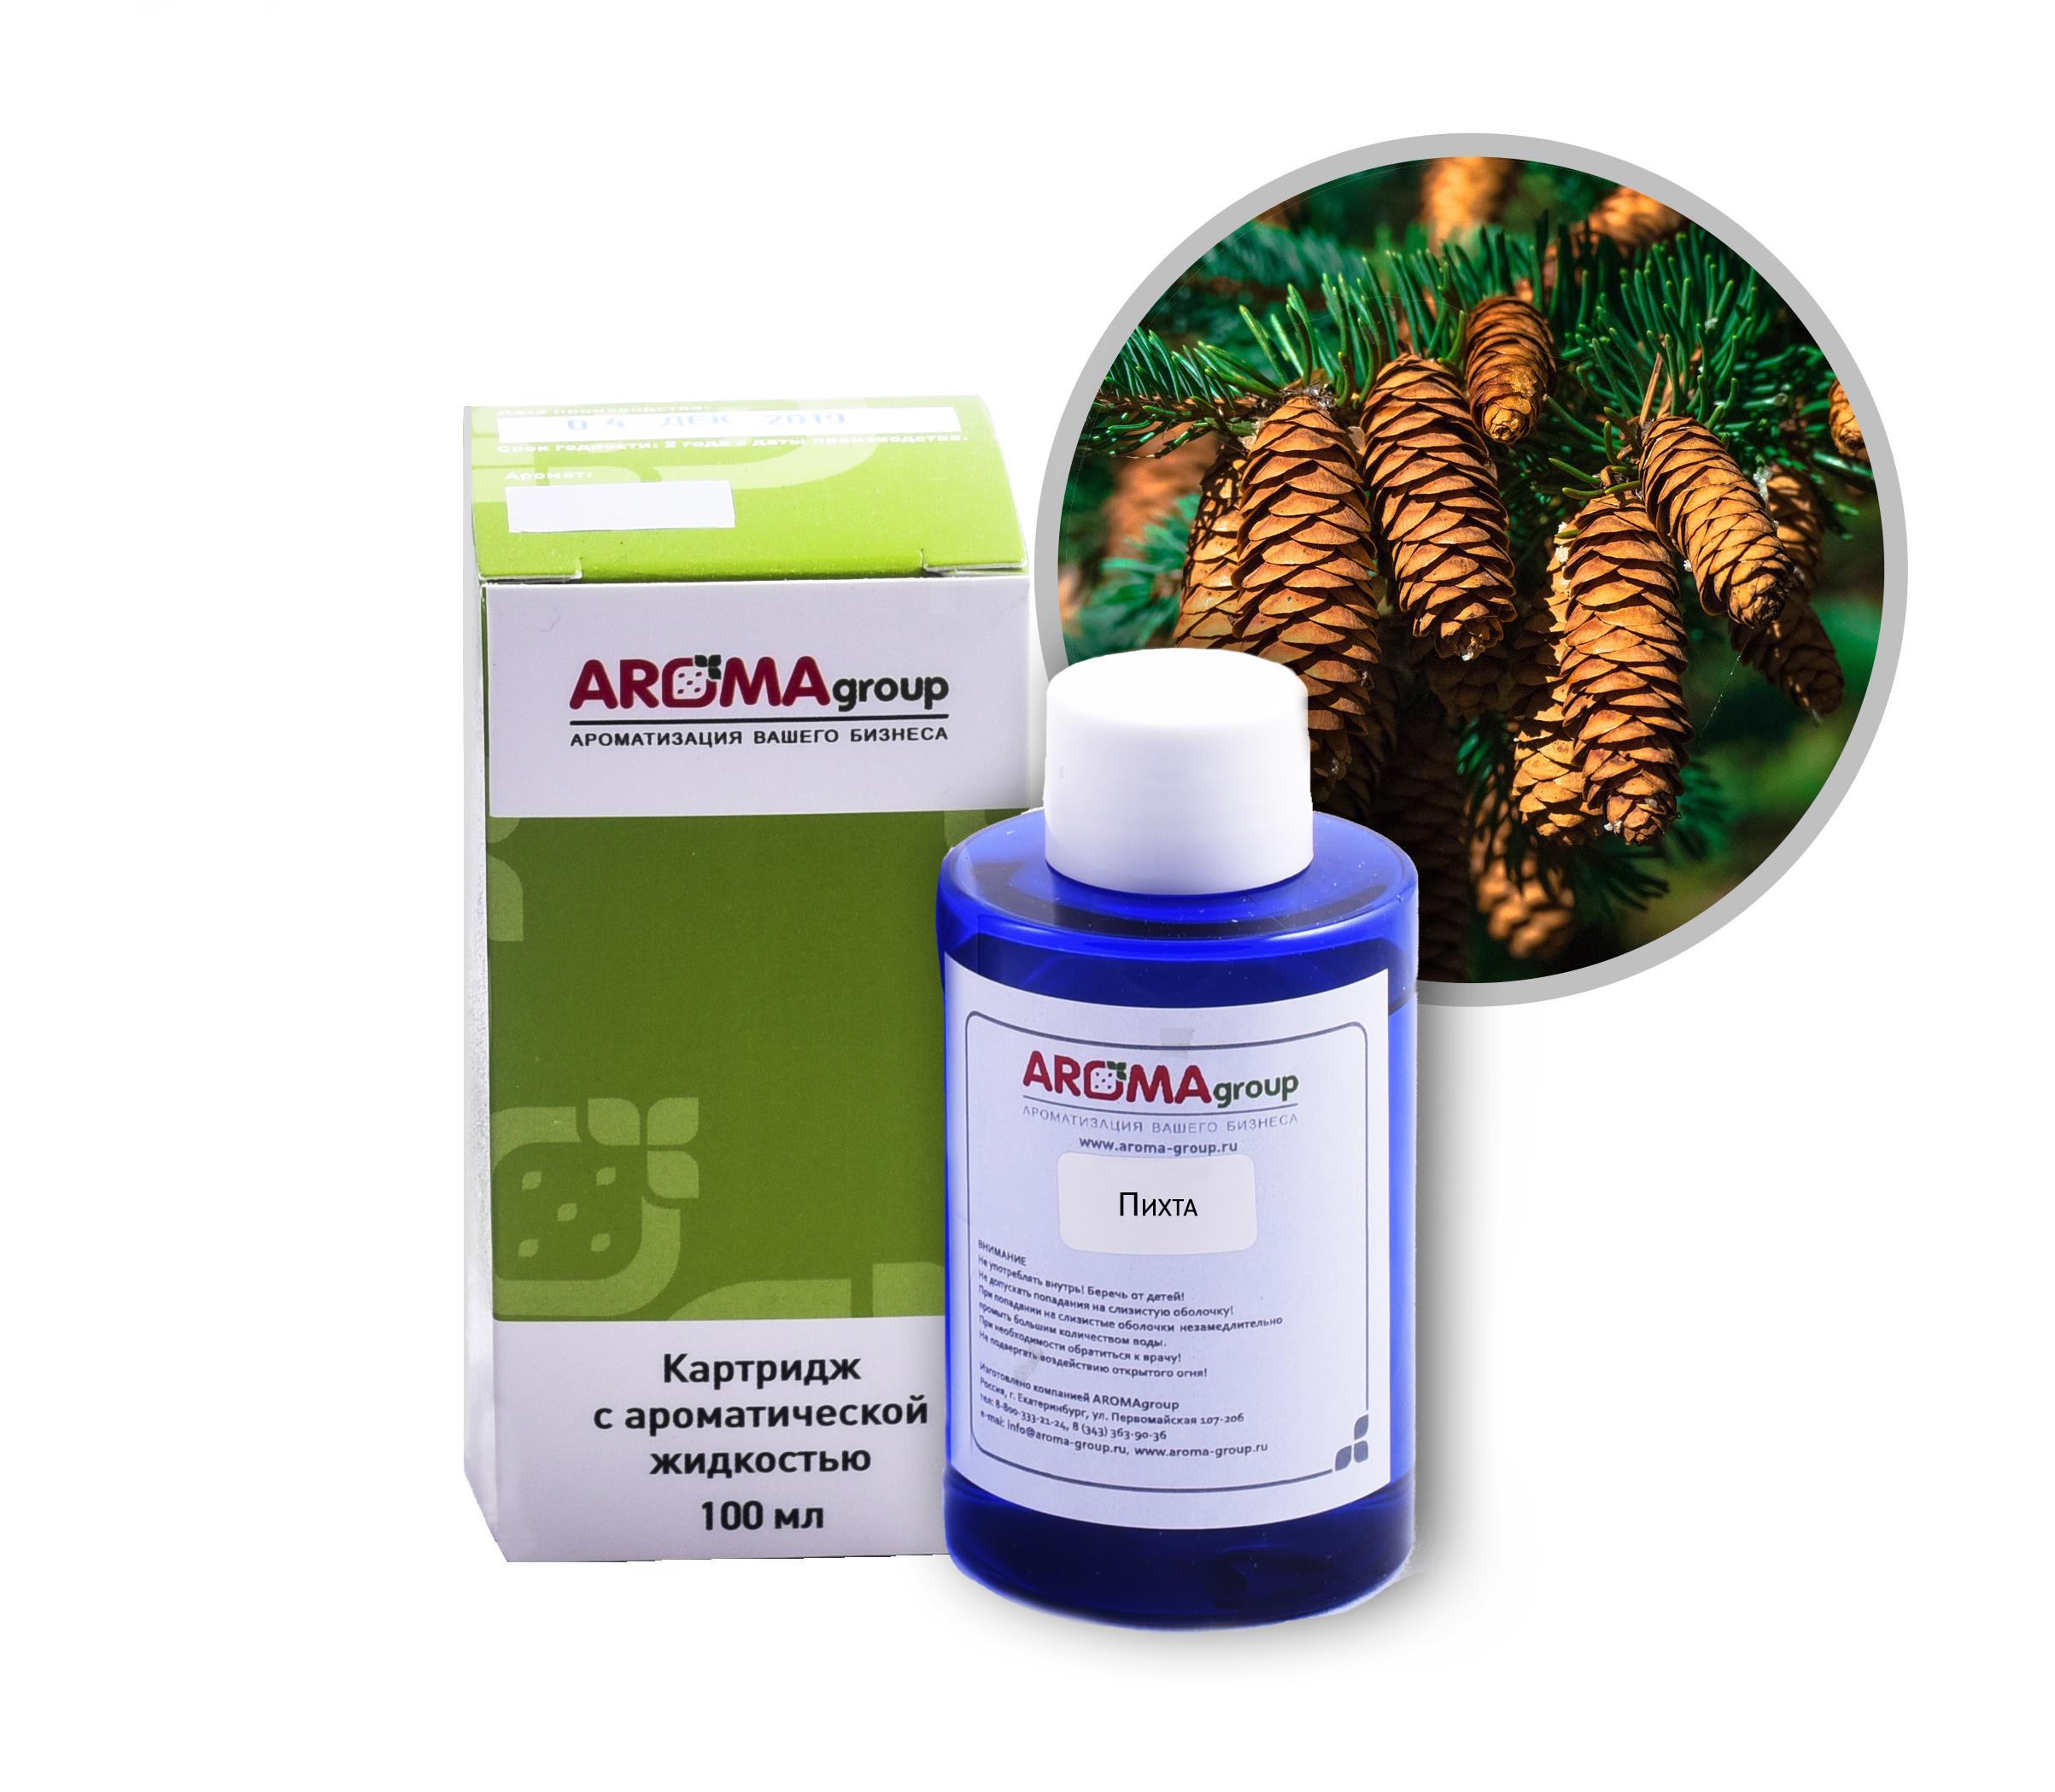 Картридж для аппарата AROMAgroup Dispenser Liquid,